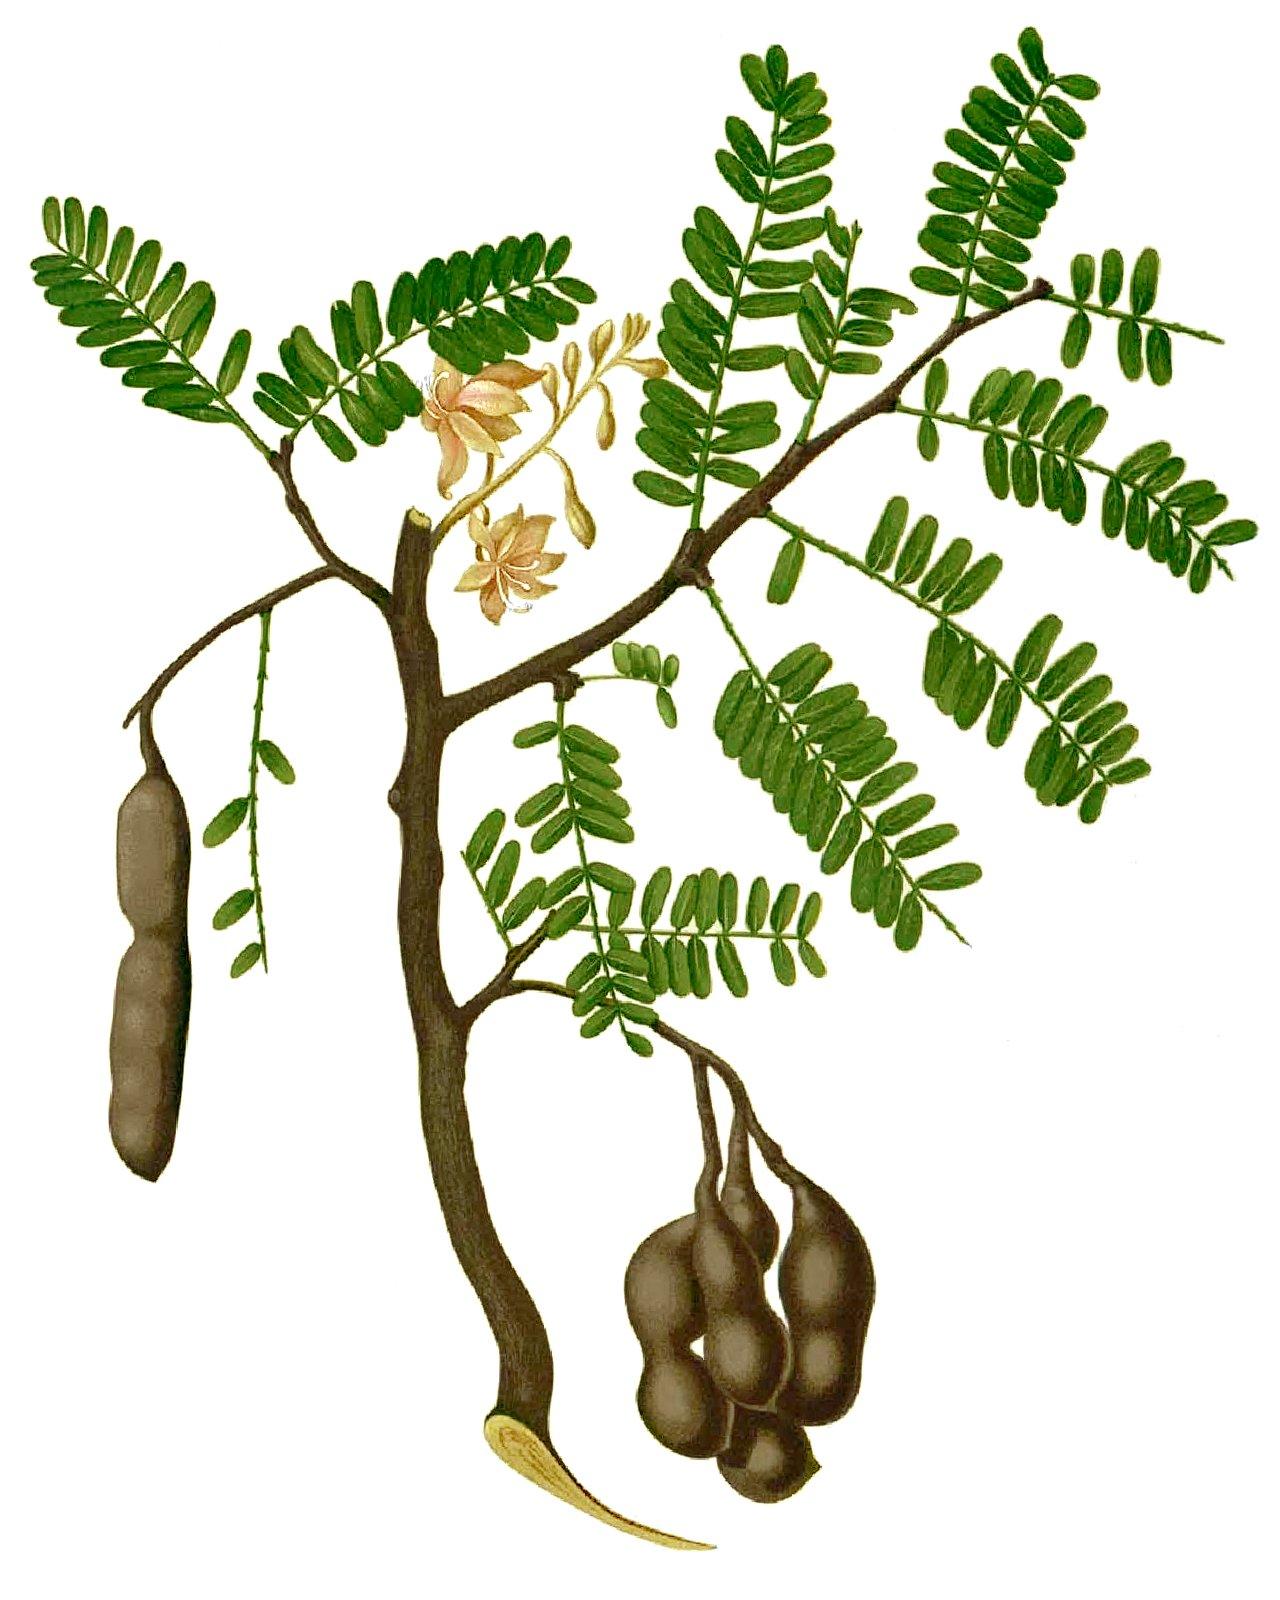 File:Tamarindus indica Blanco1.14-cropped.jpg - Wikimedia ...